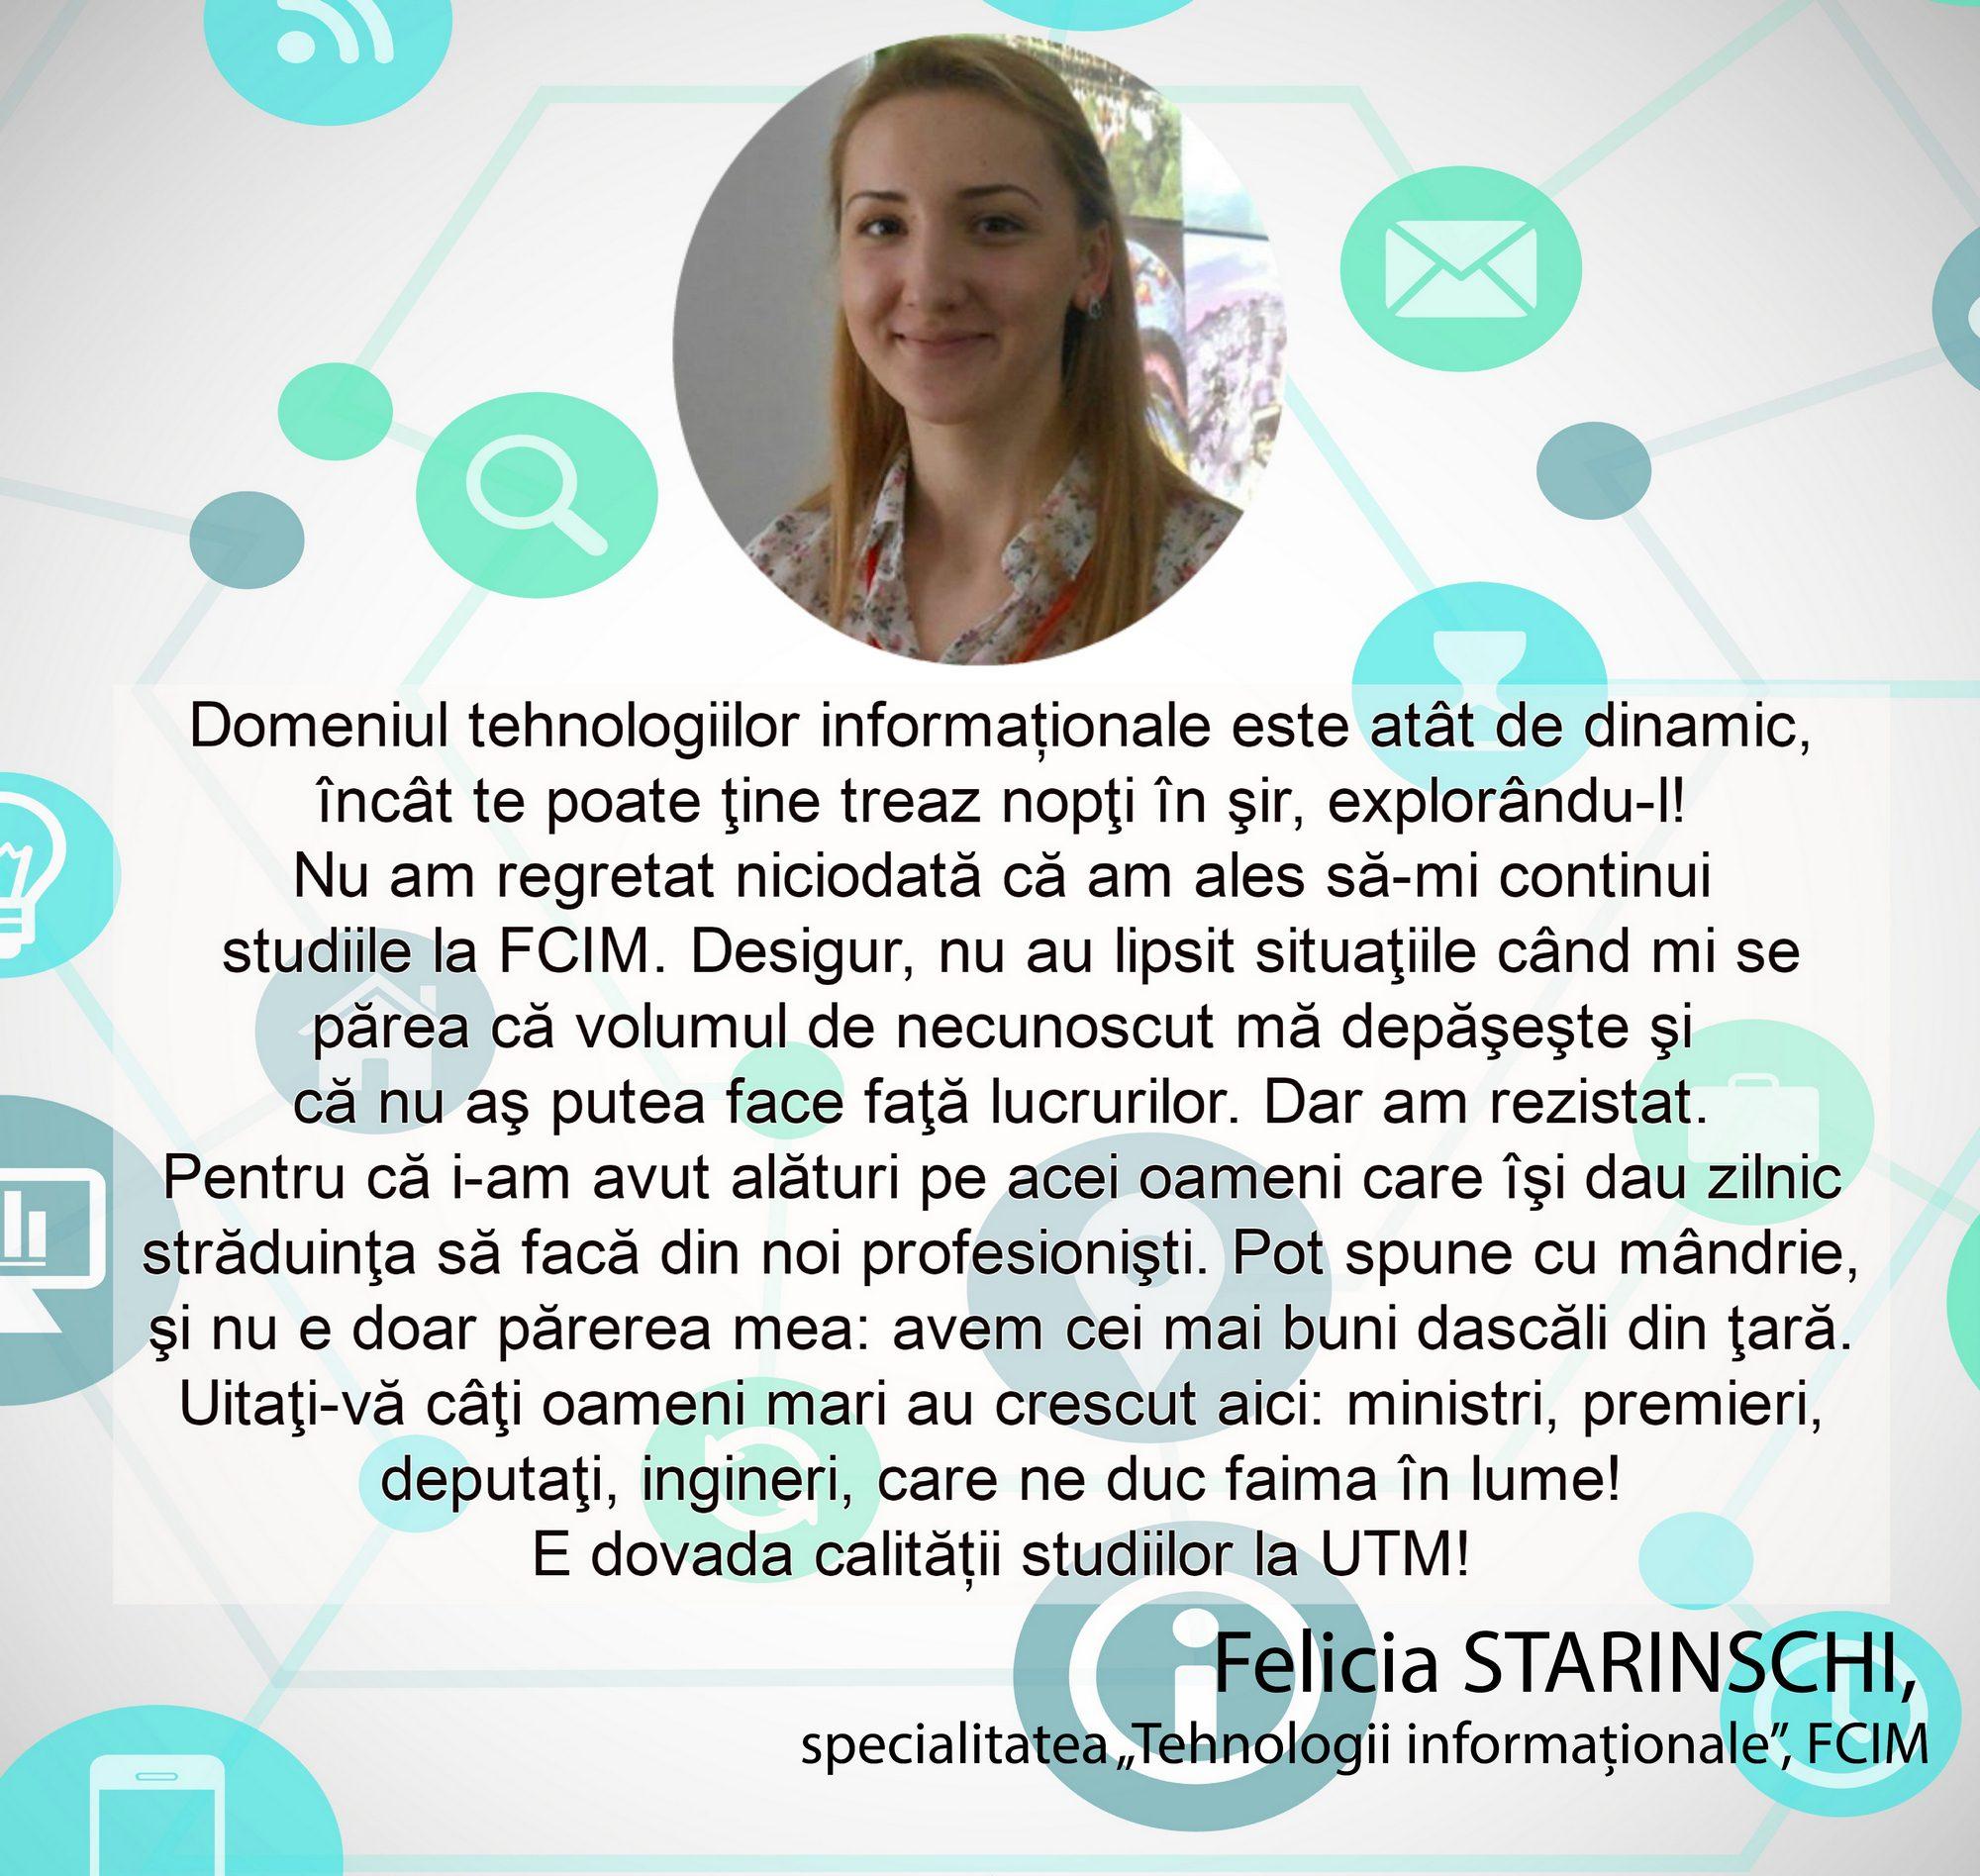 Felicia STARINSCHI - FCIM